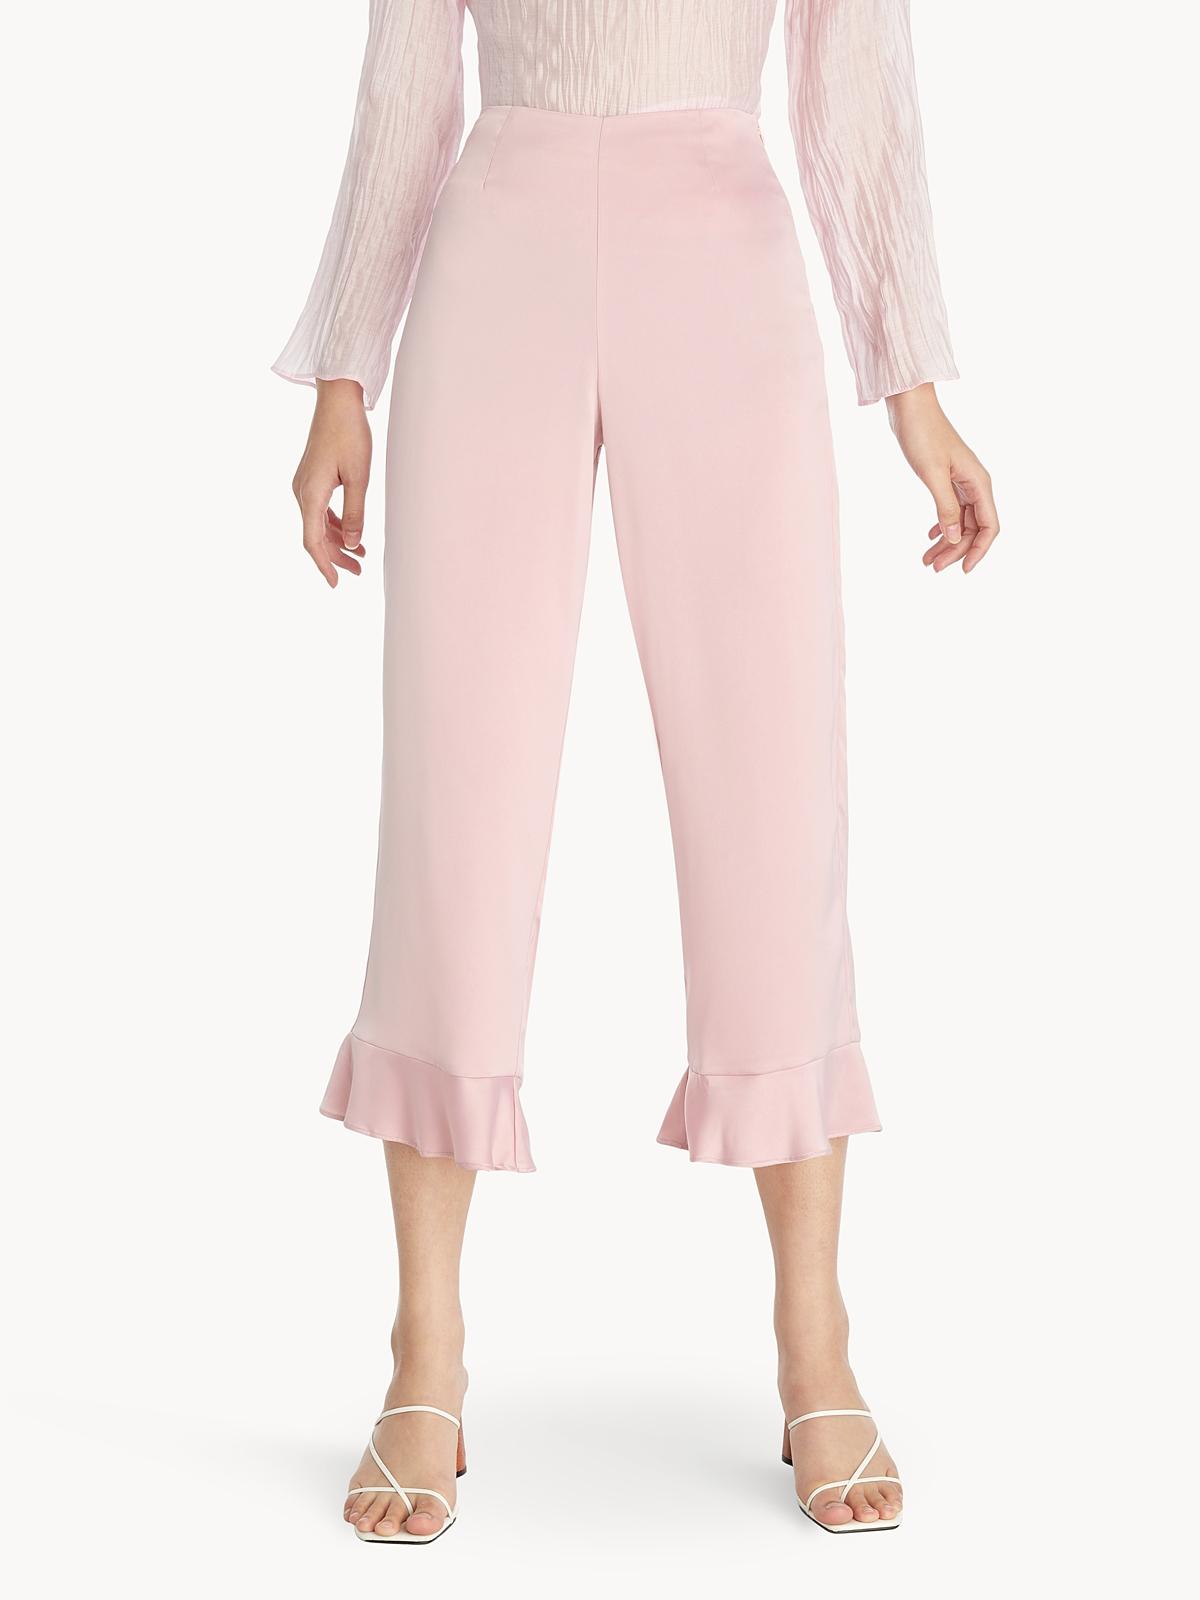 Cropped Bottom Frill Satin Pants Pink